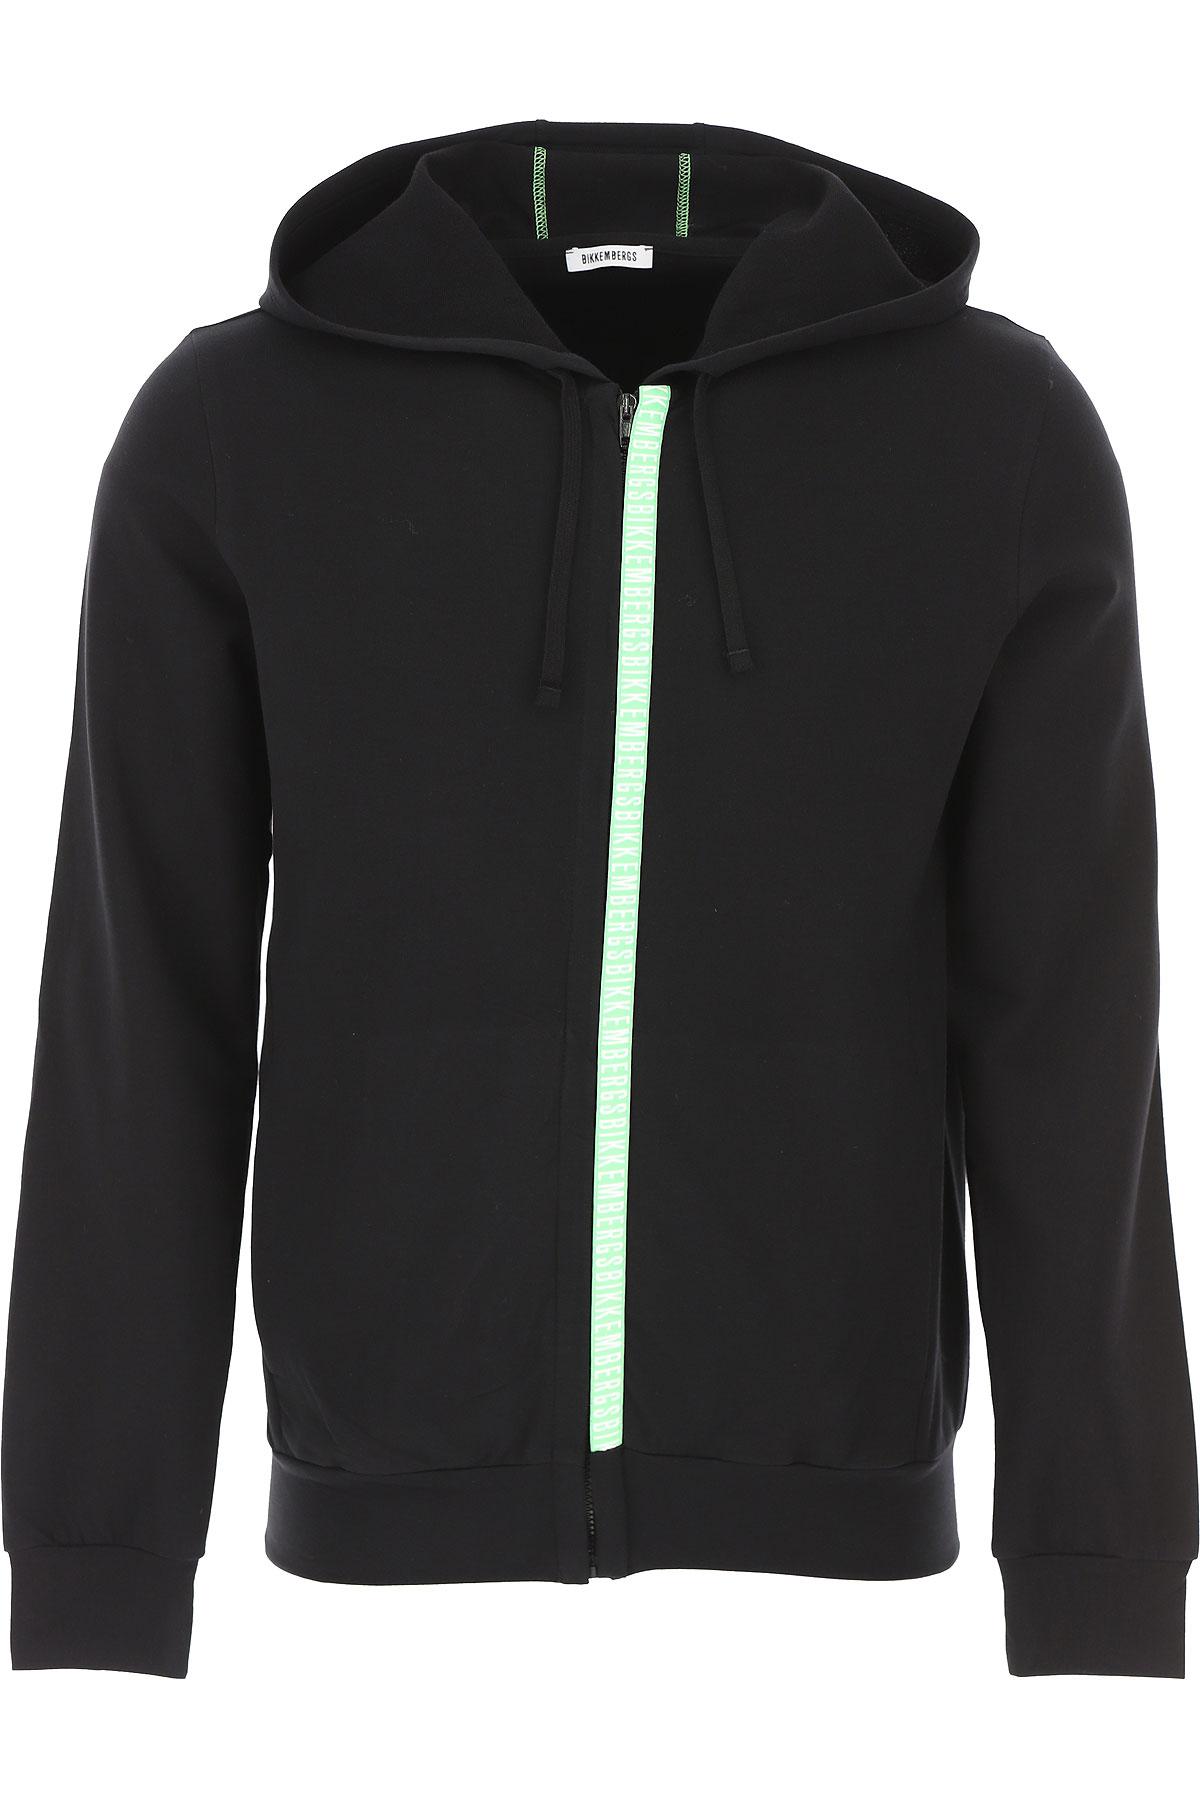 Bikkembergs Sweatshirt for Men On Sale, Black, Cotton, 2019, L M S XL